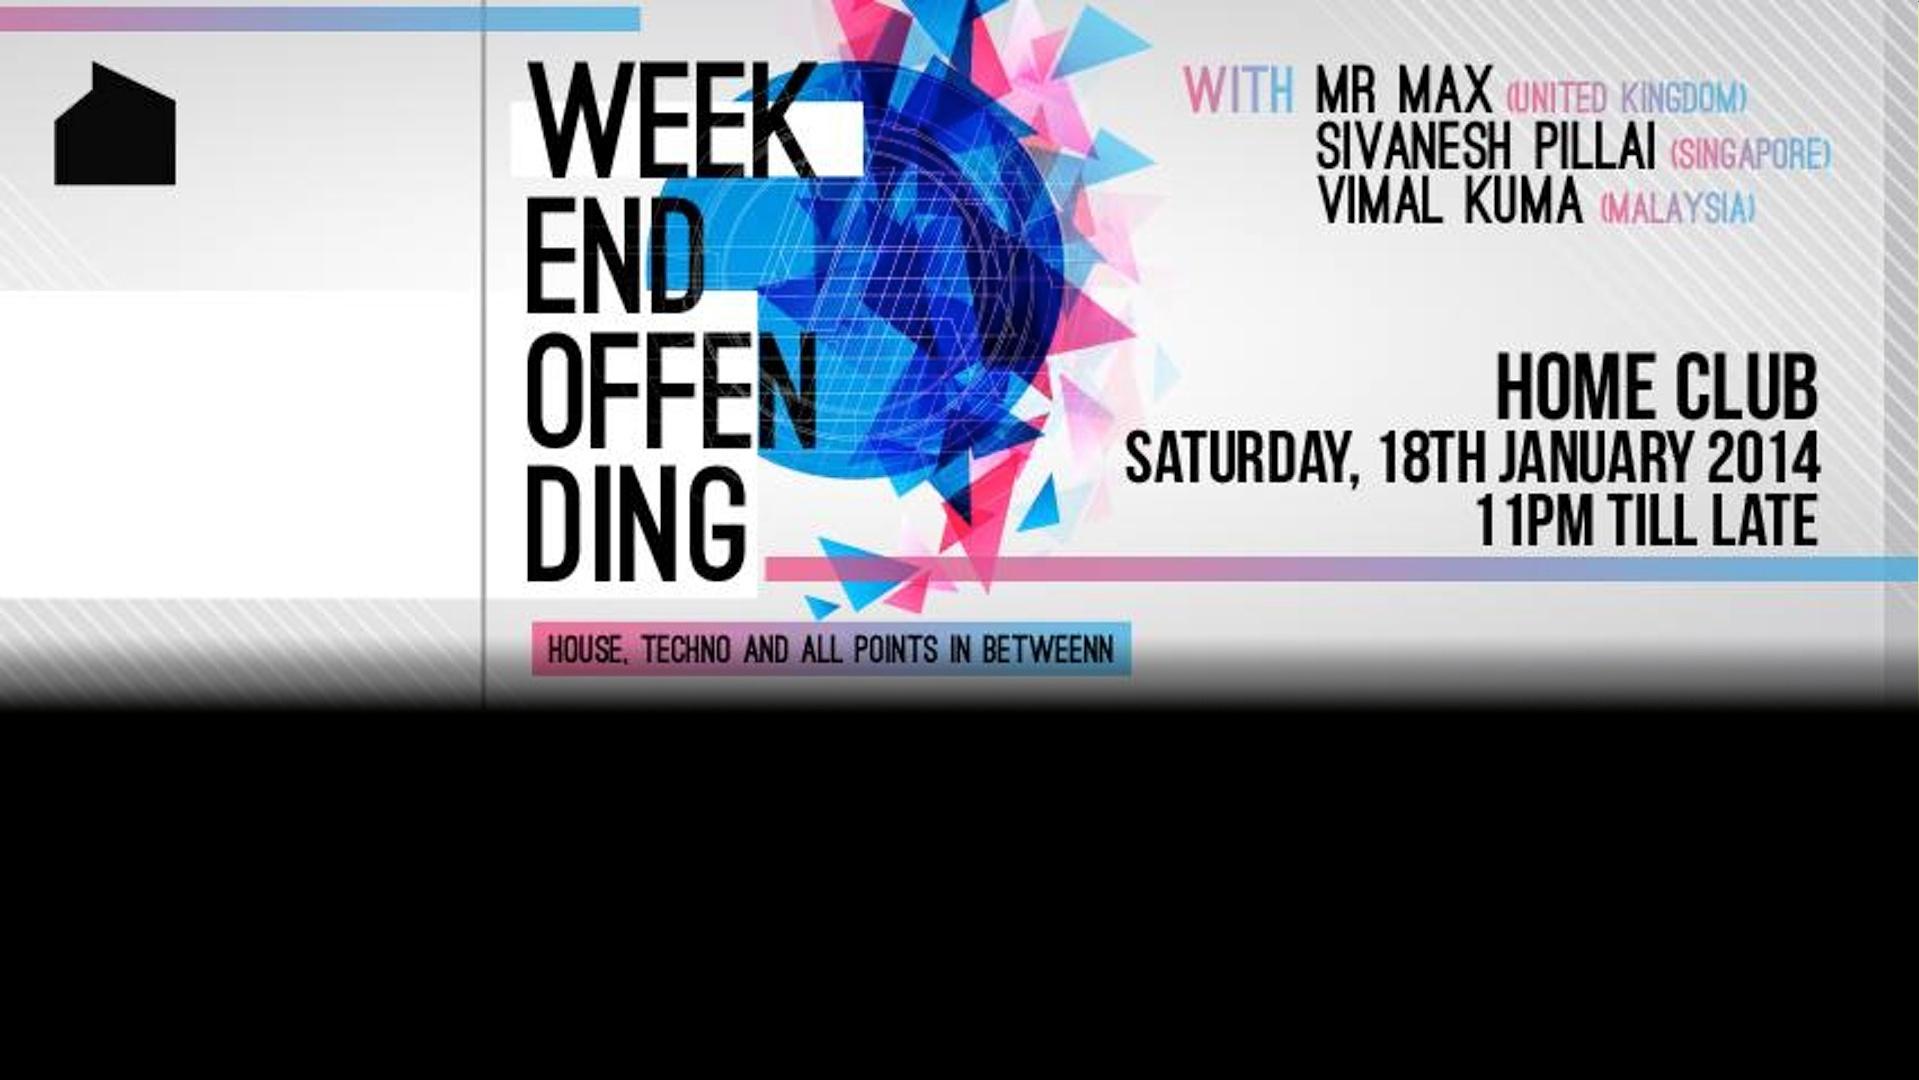 Weekend Offending